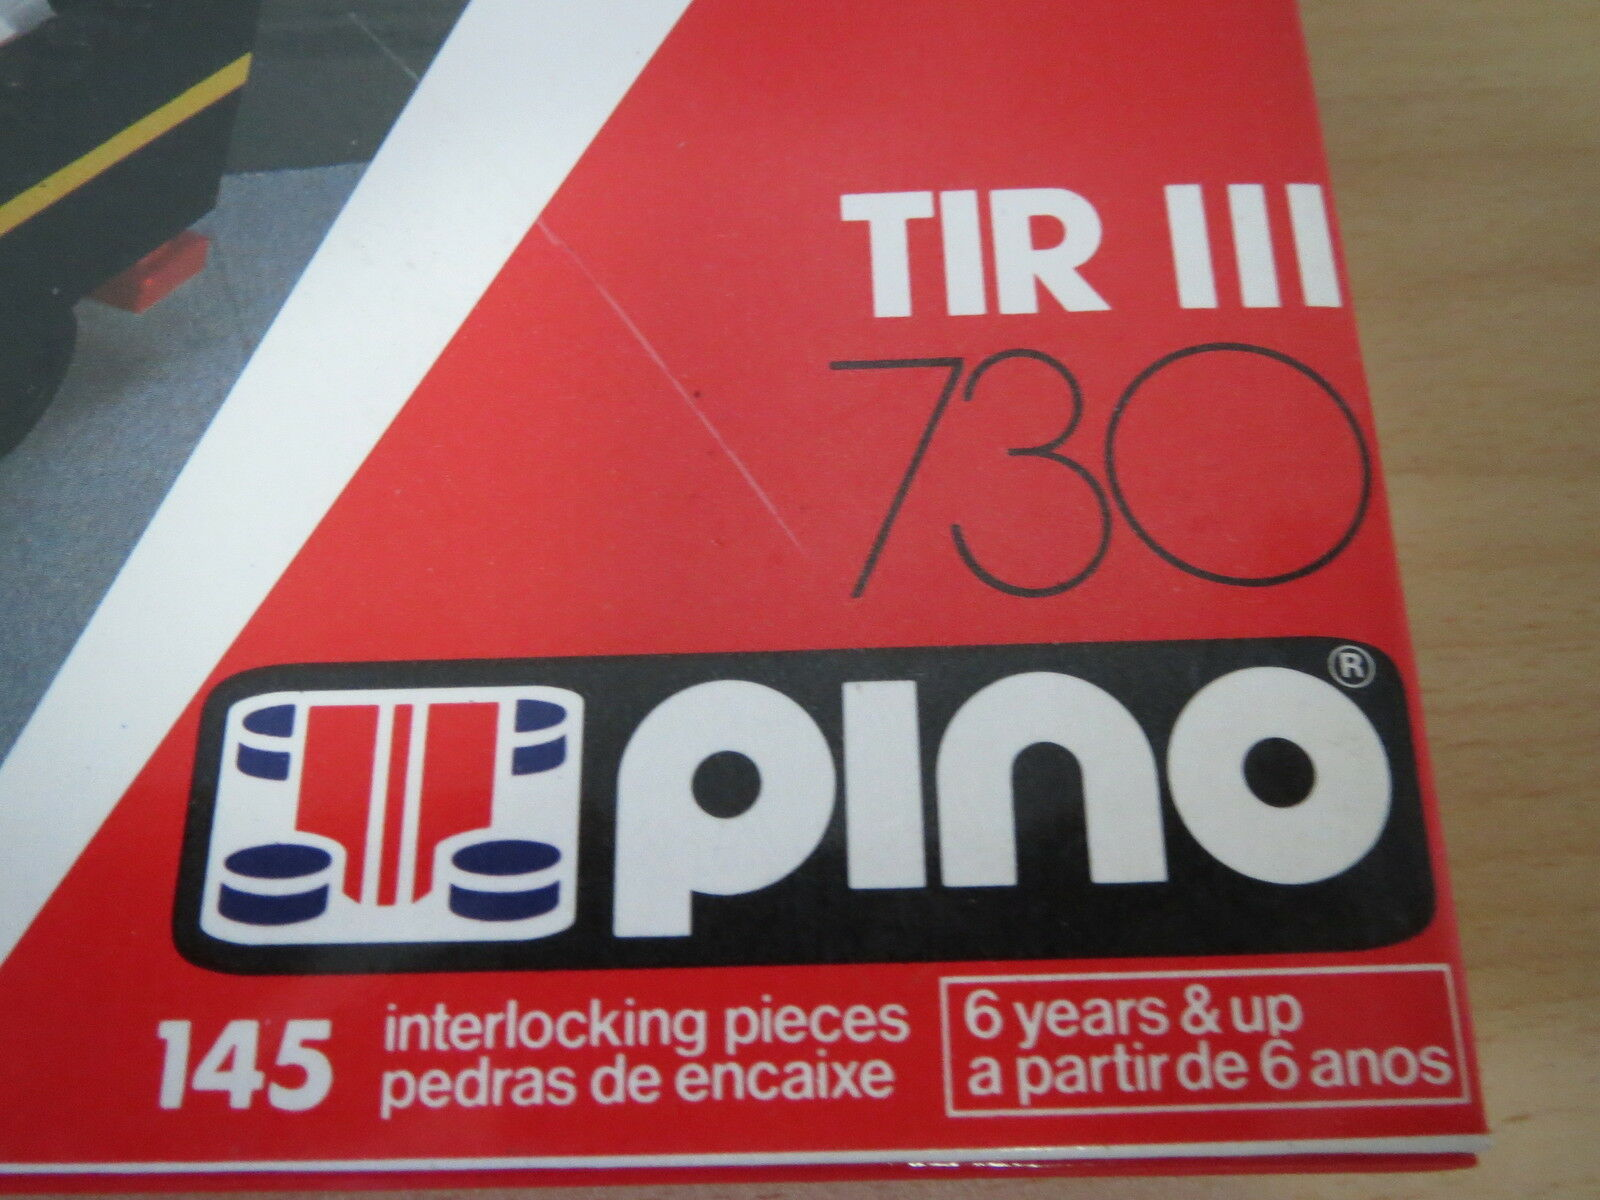 Vintage Portuguese LEGO PINO 730 - TIR 730 PINO - CASTROL OIL - Made in Azores (Portugal) a9540f